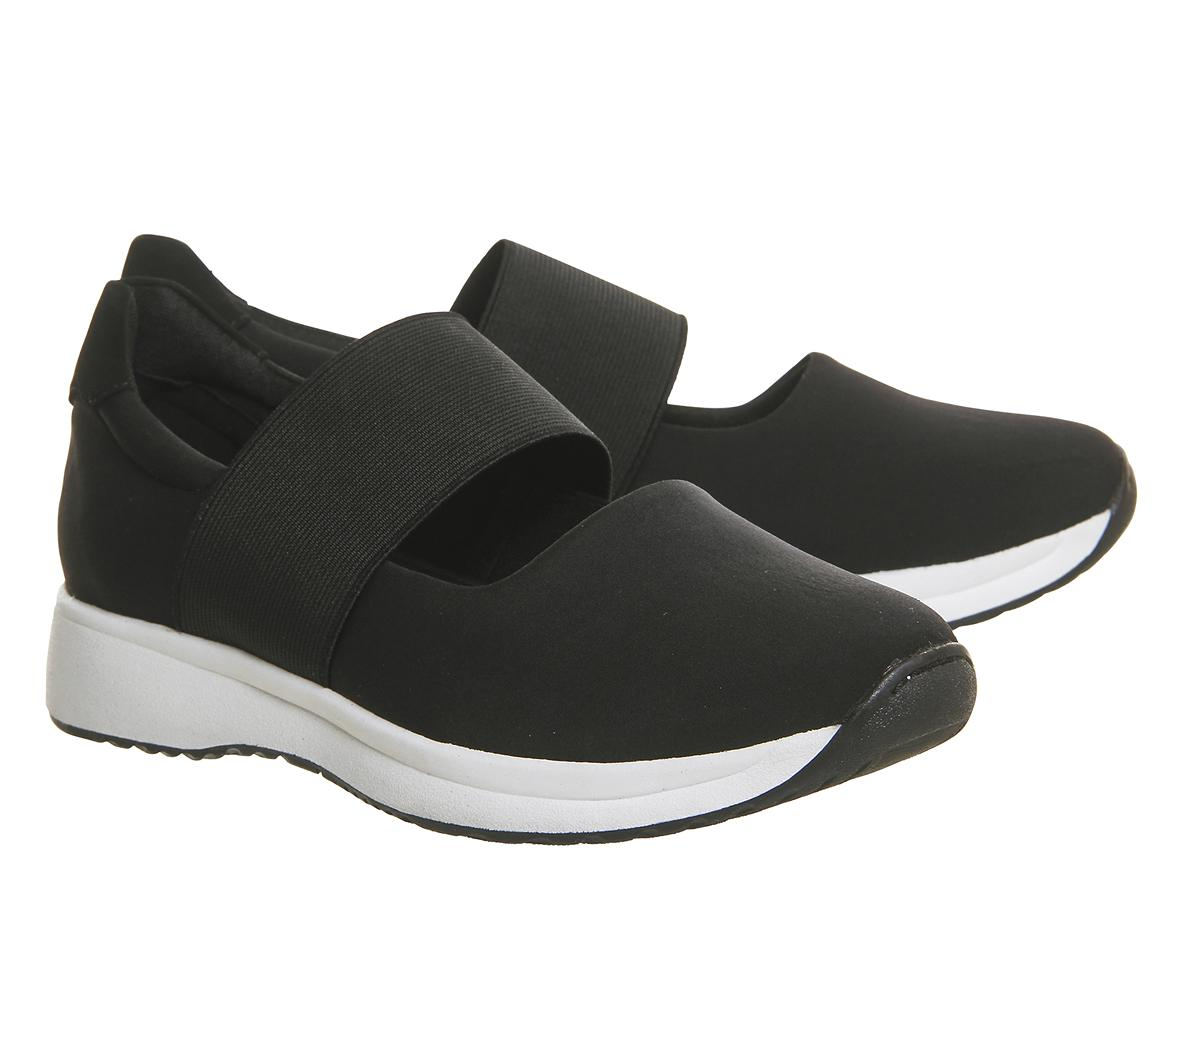 White Mary Jane Shoes Australia